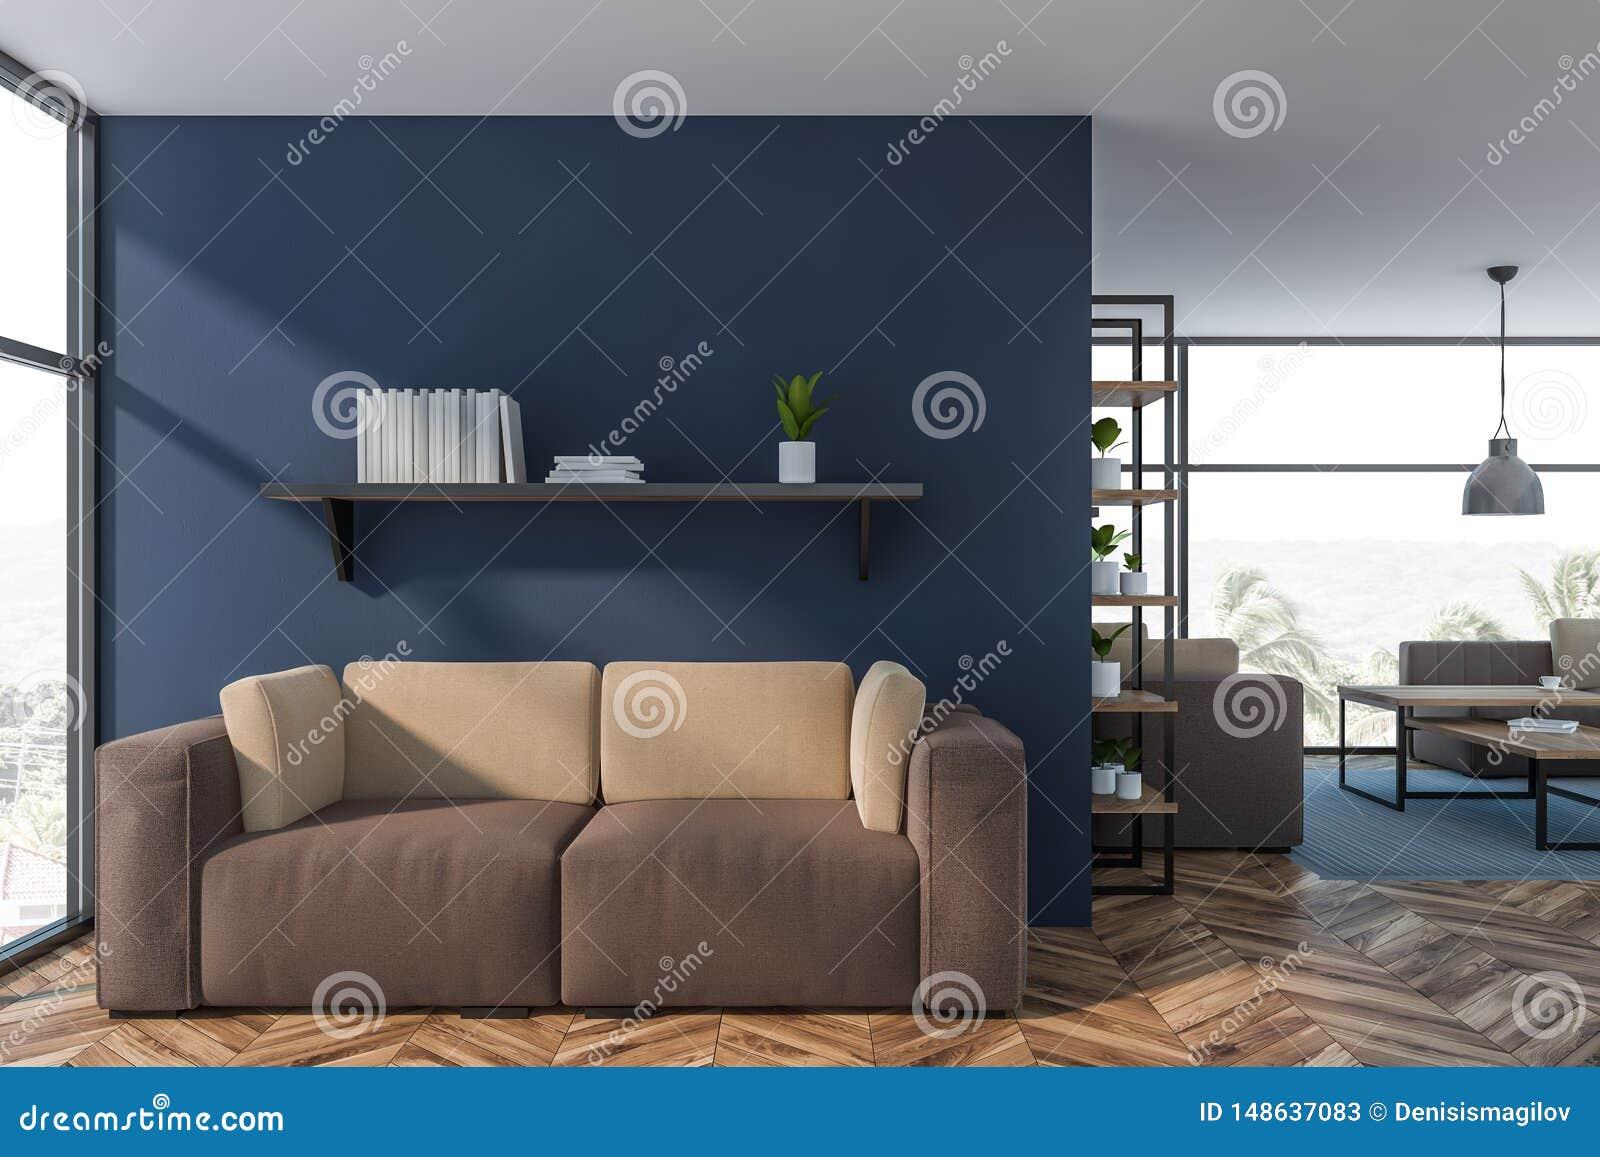 Luxury Blue Living Room Interior With Sofa Stock ...